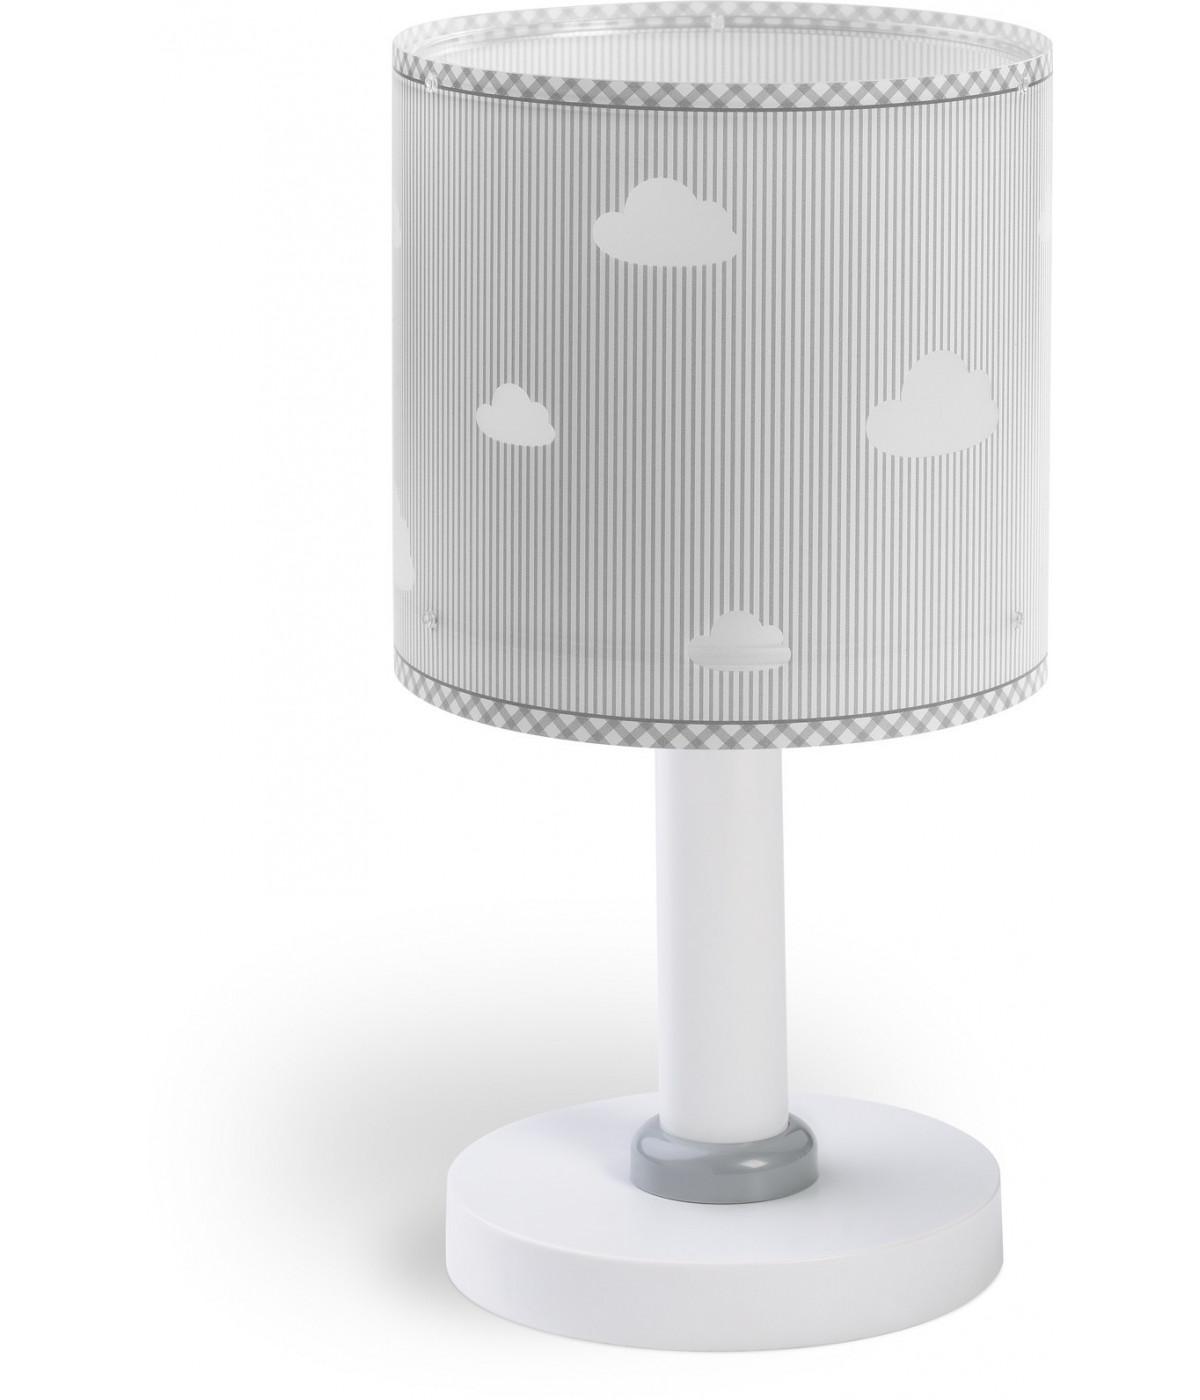 Candeeiro infantil de mesa com nuvens Sweet Dreams cinza